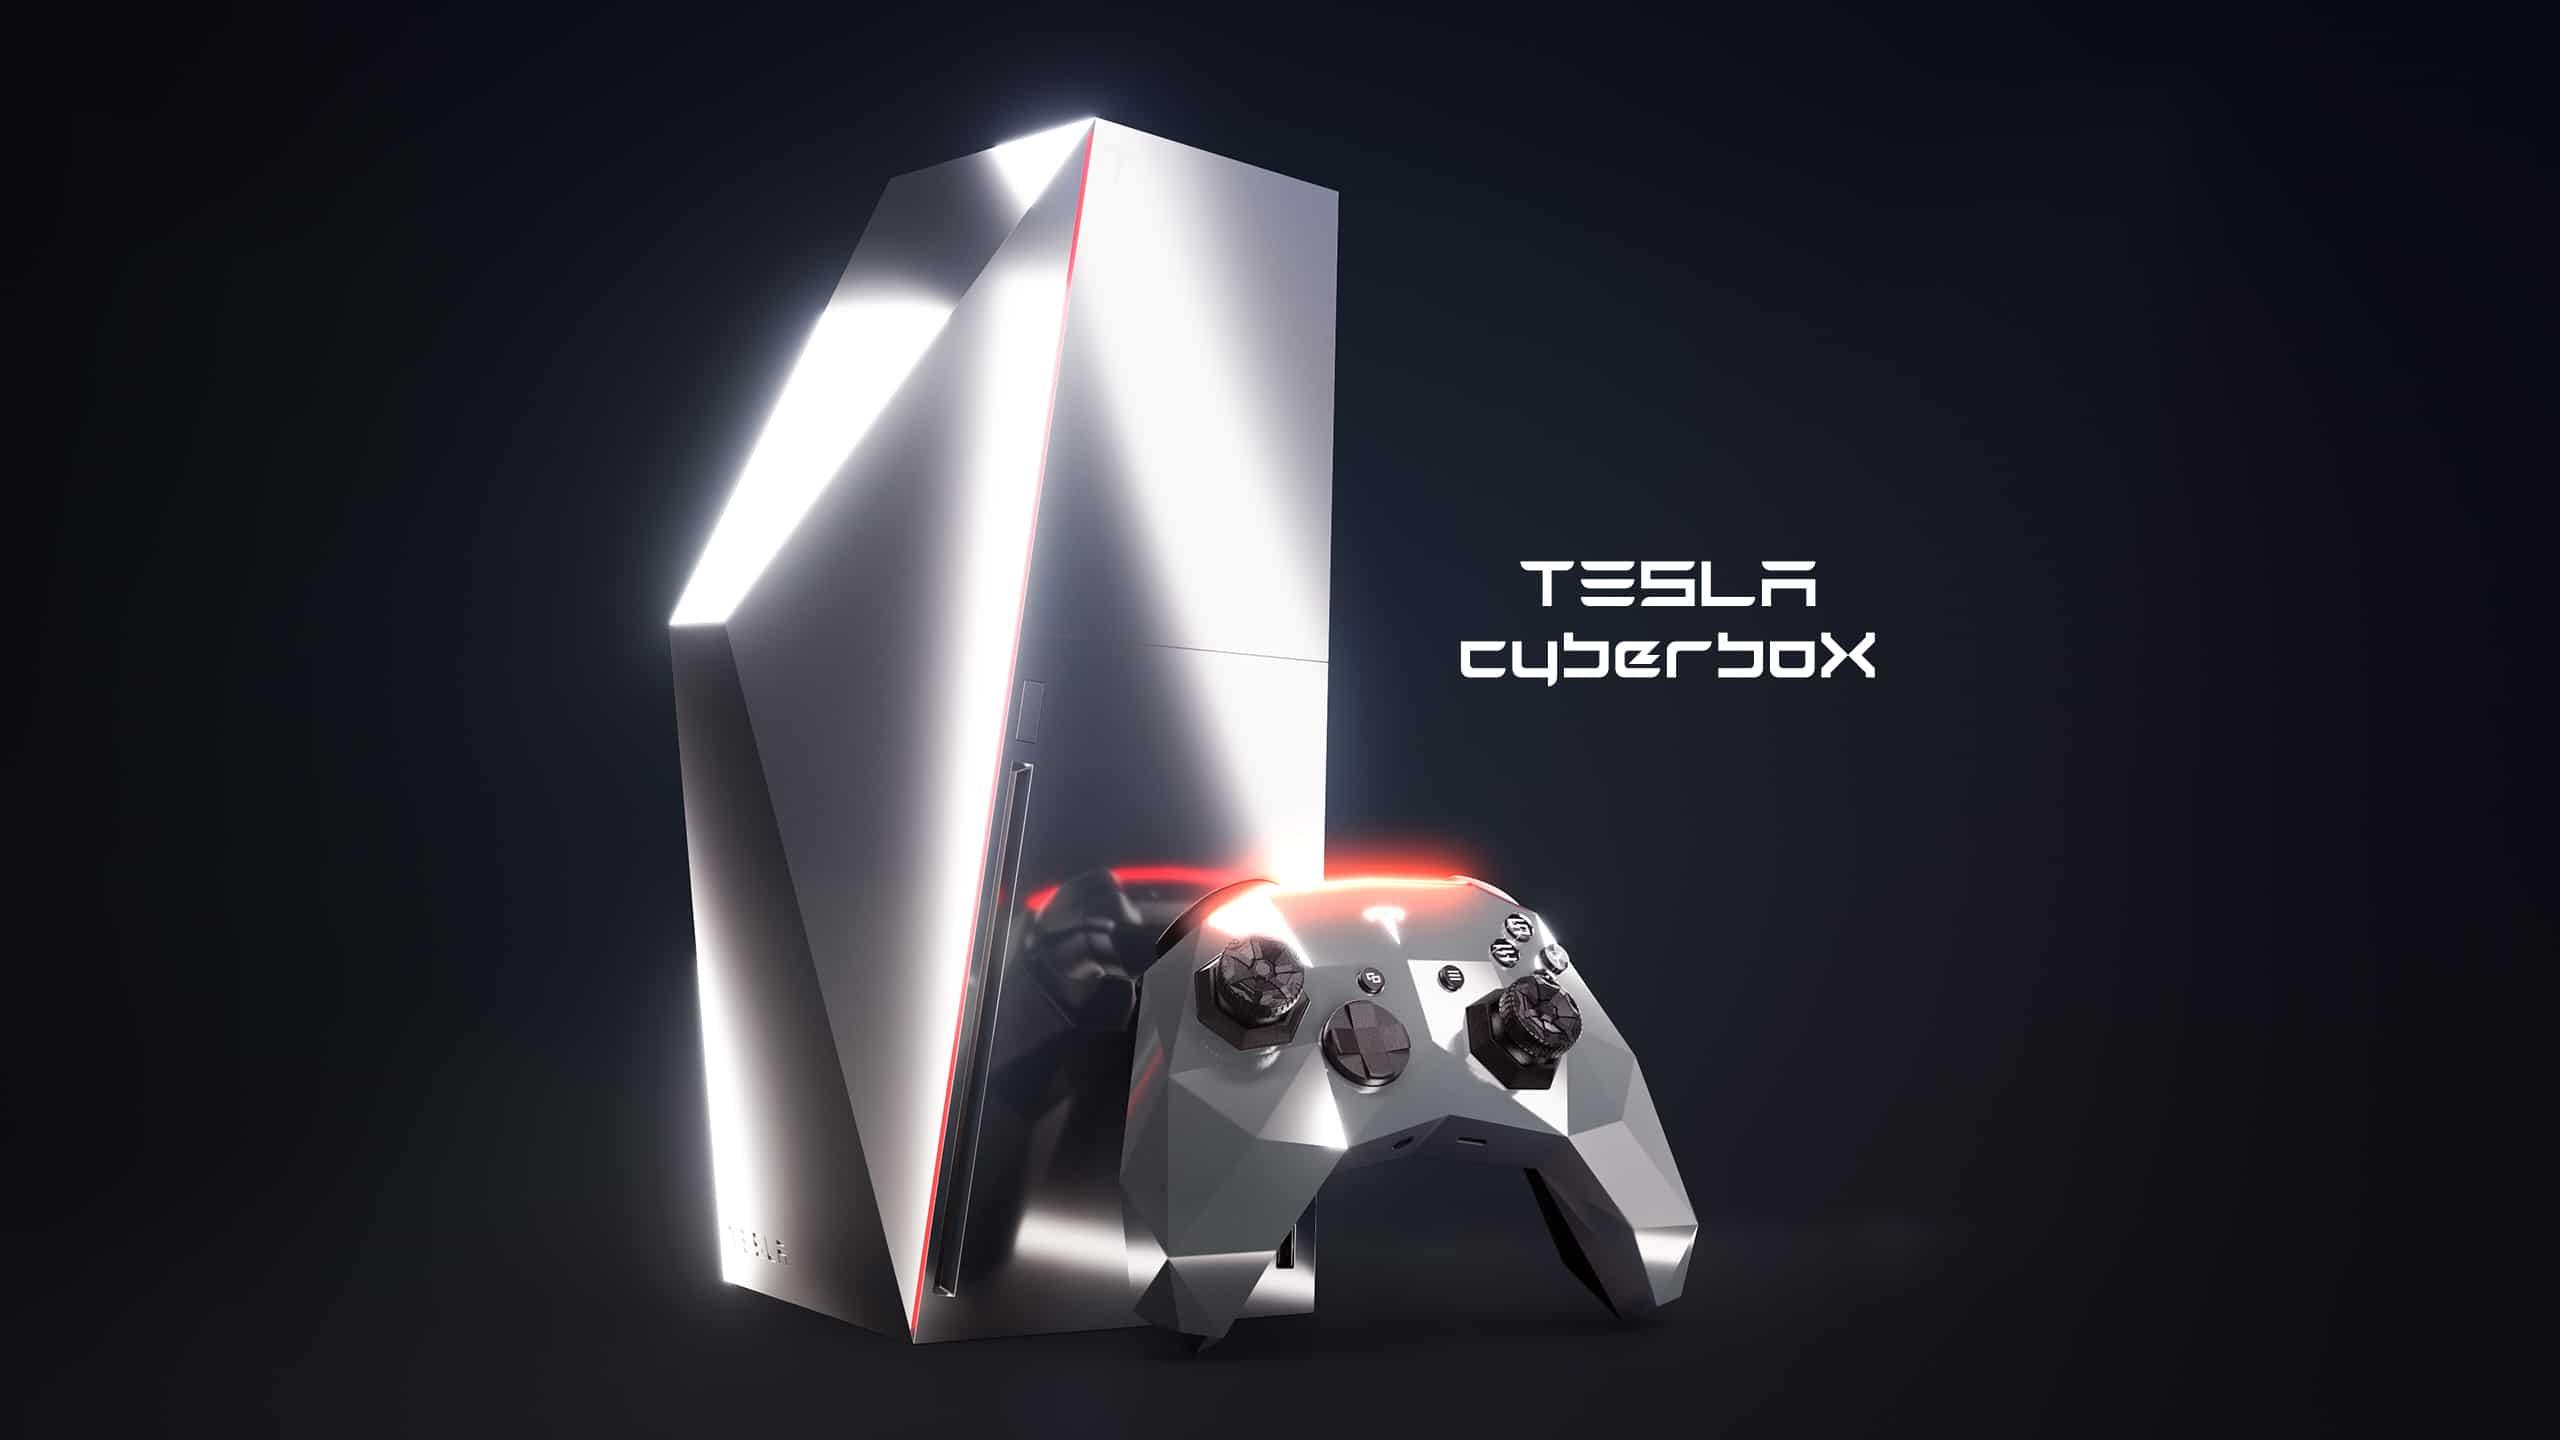 Tesla cyberboX